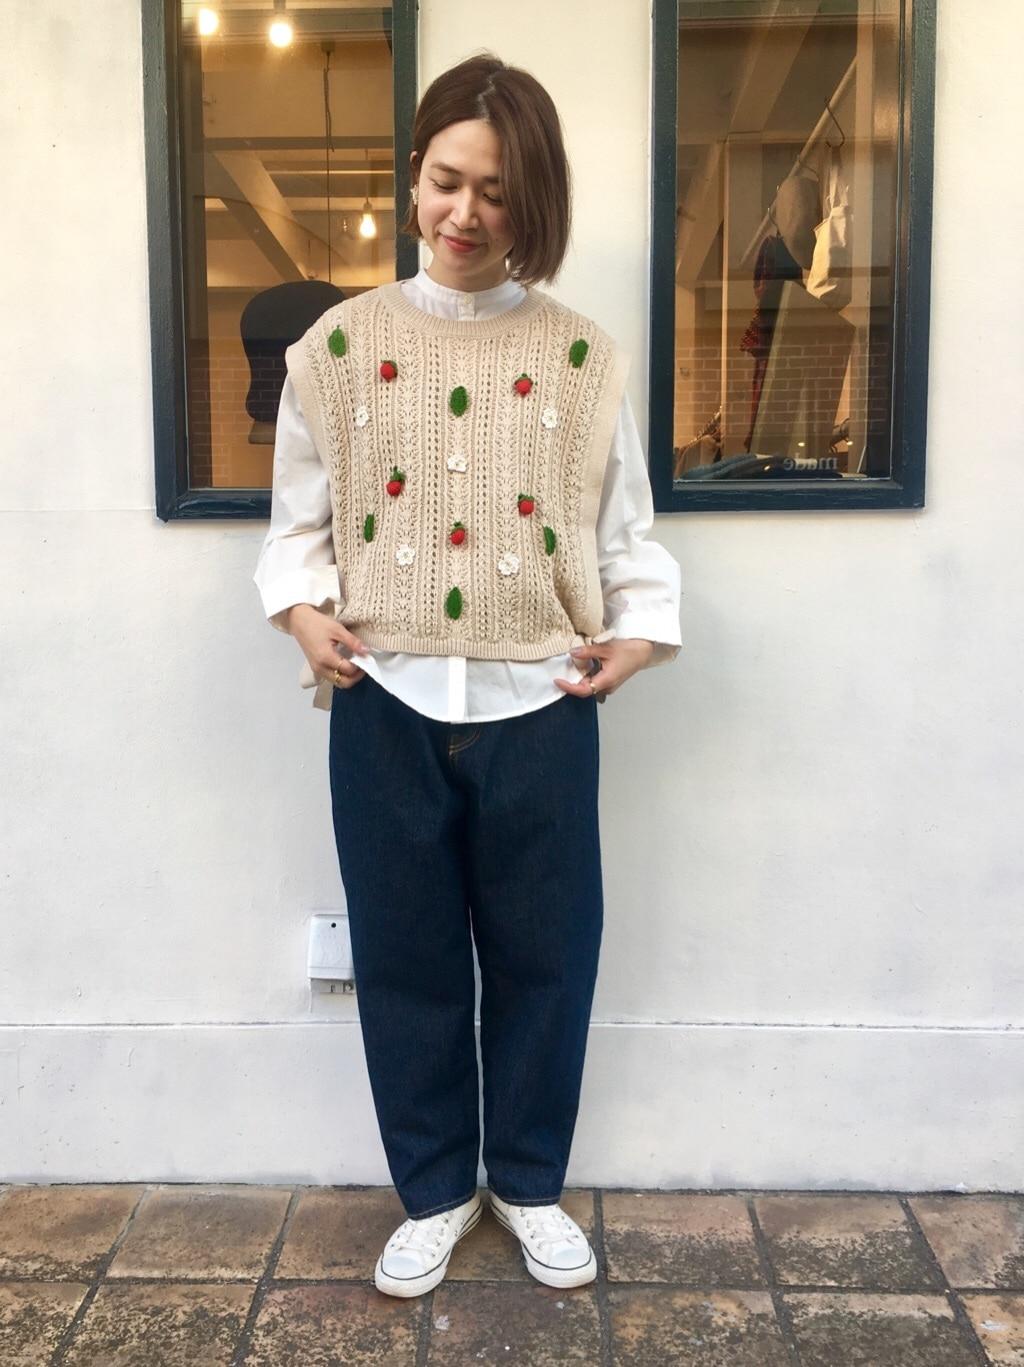 chambre de charme 横浜ジョイナス 身長:160cm 2021.01.04